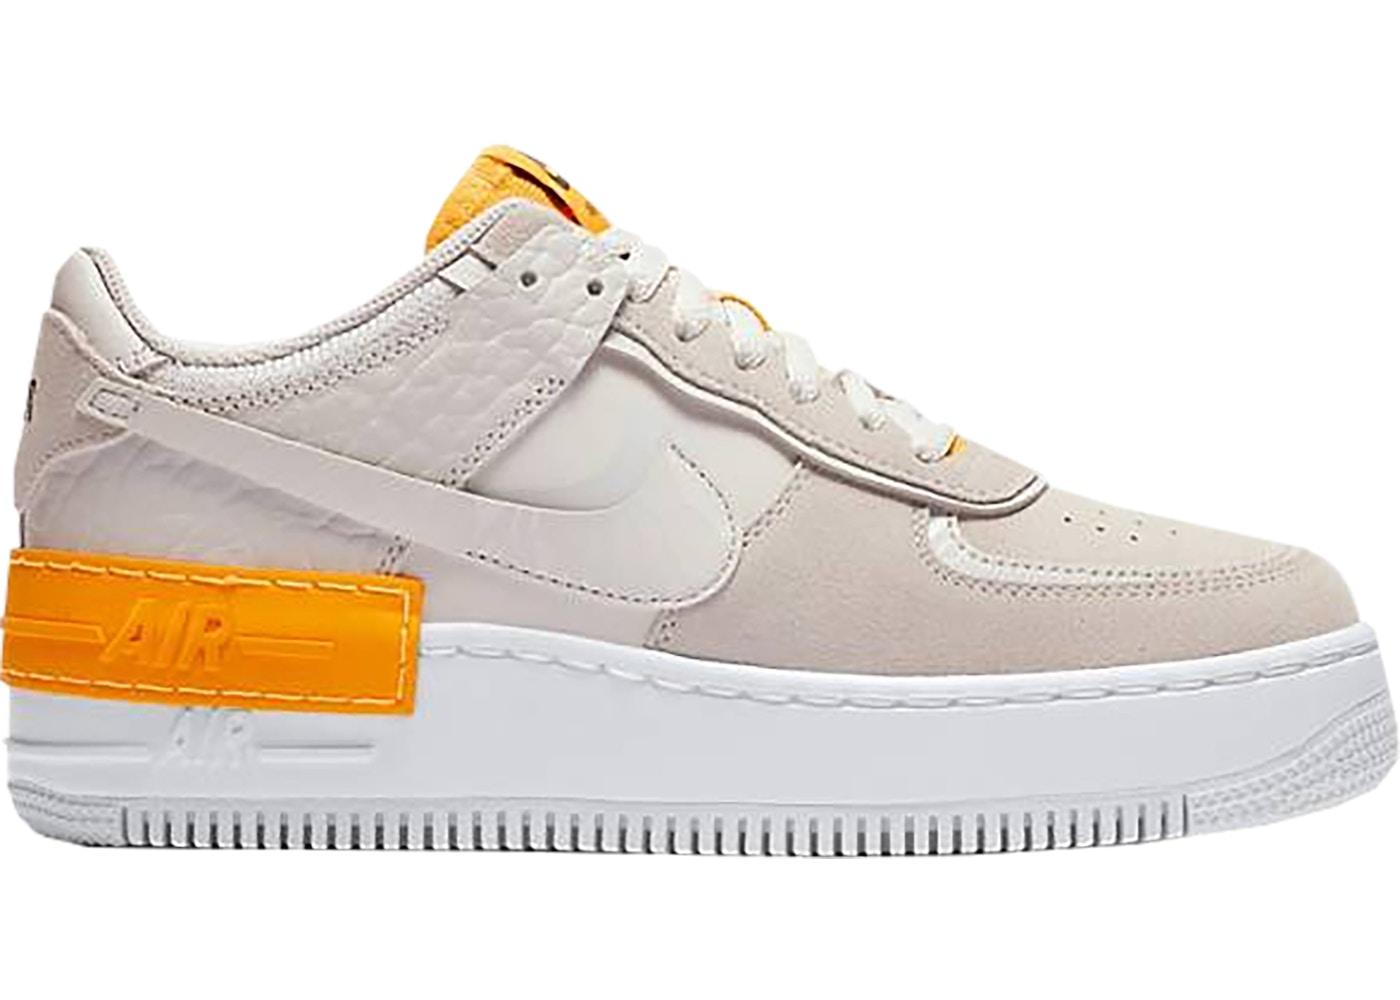 Nike Air Force 1 Shadow Vast Grey Laser Orange (W)